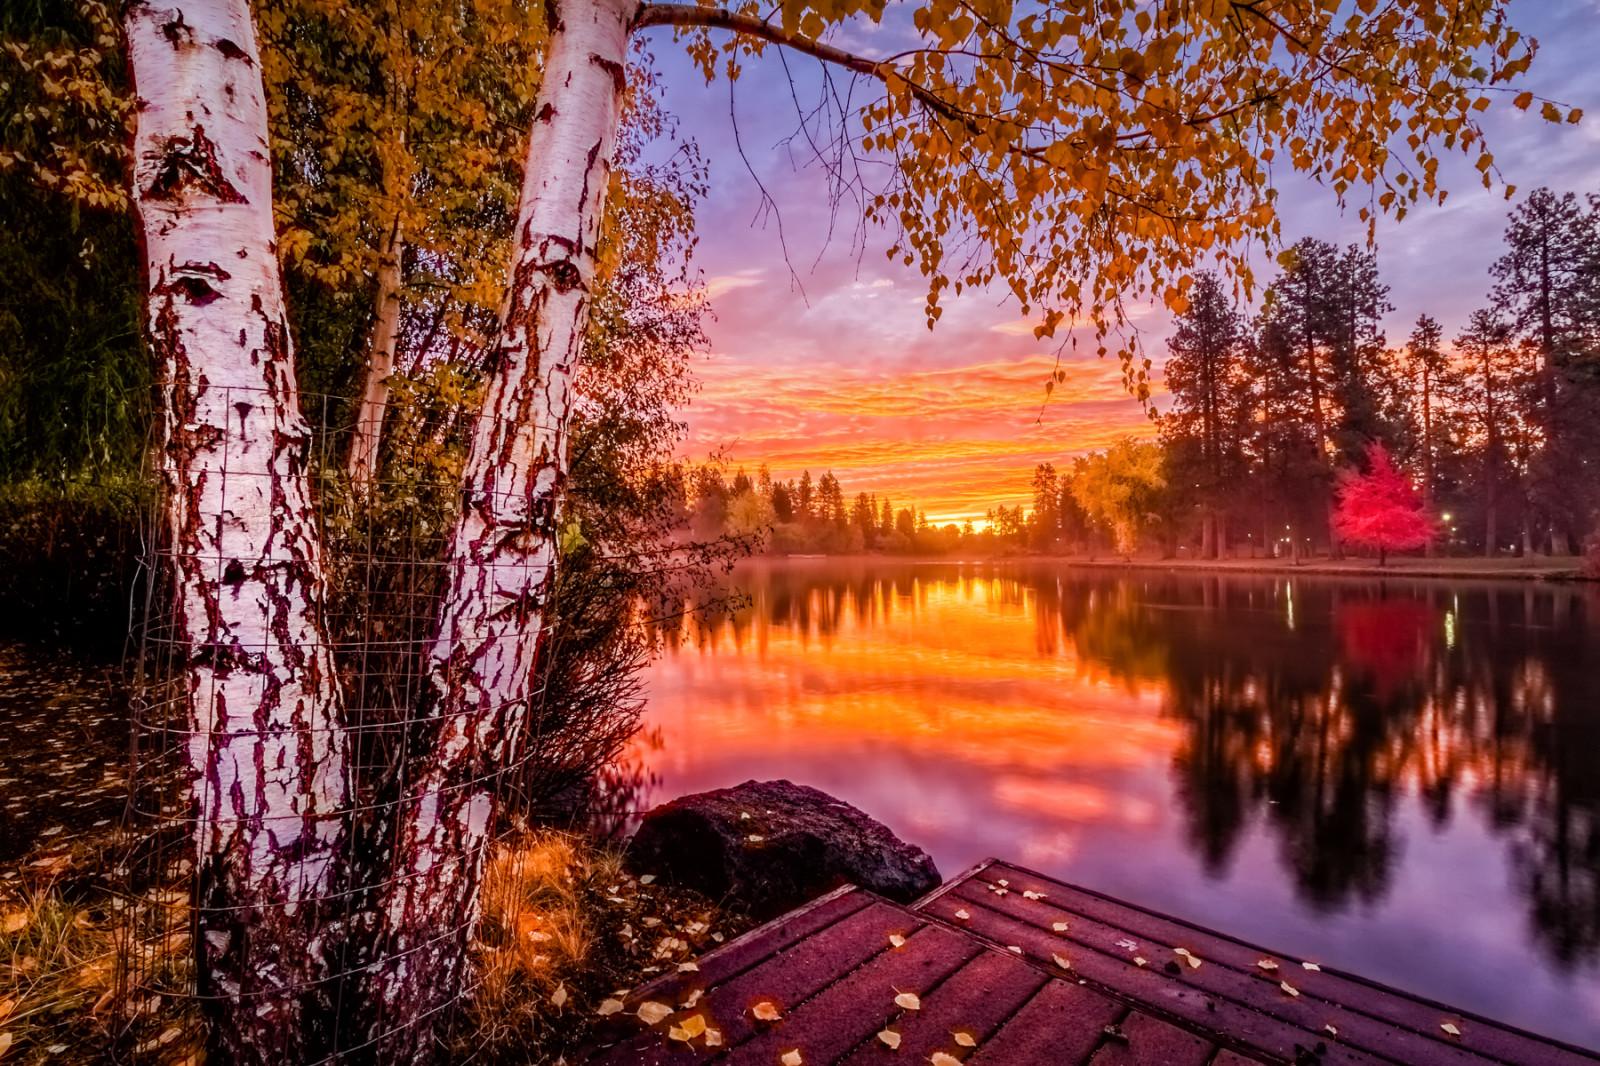 Portland Or Fall Had Wallpaper Wallpaper Sunlight Trees Landscape Forest Fall